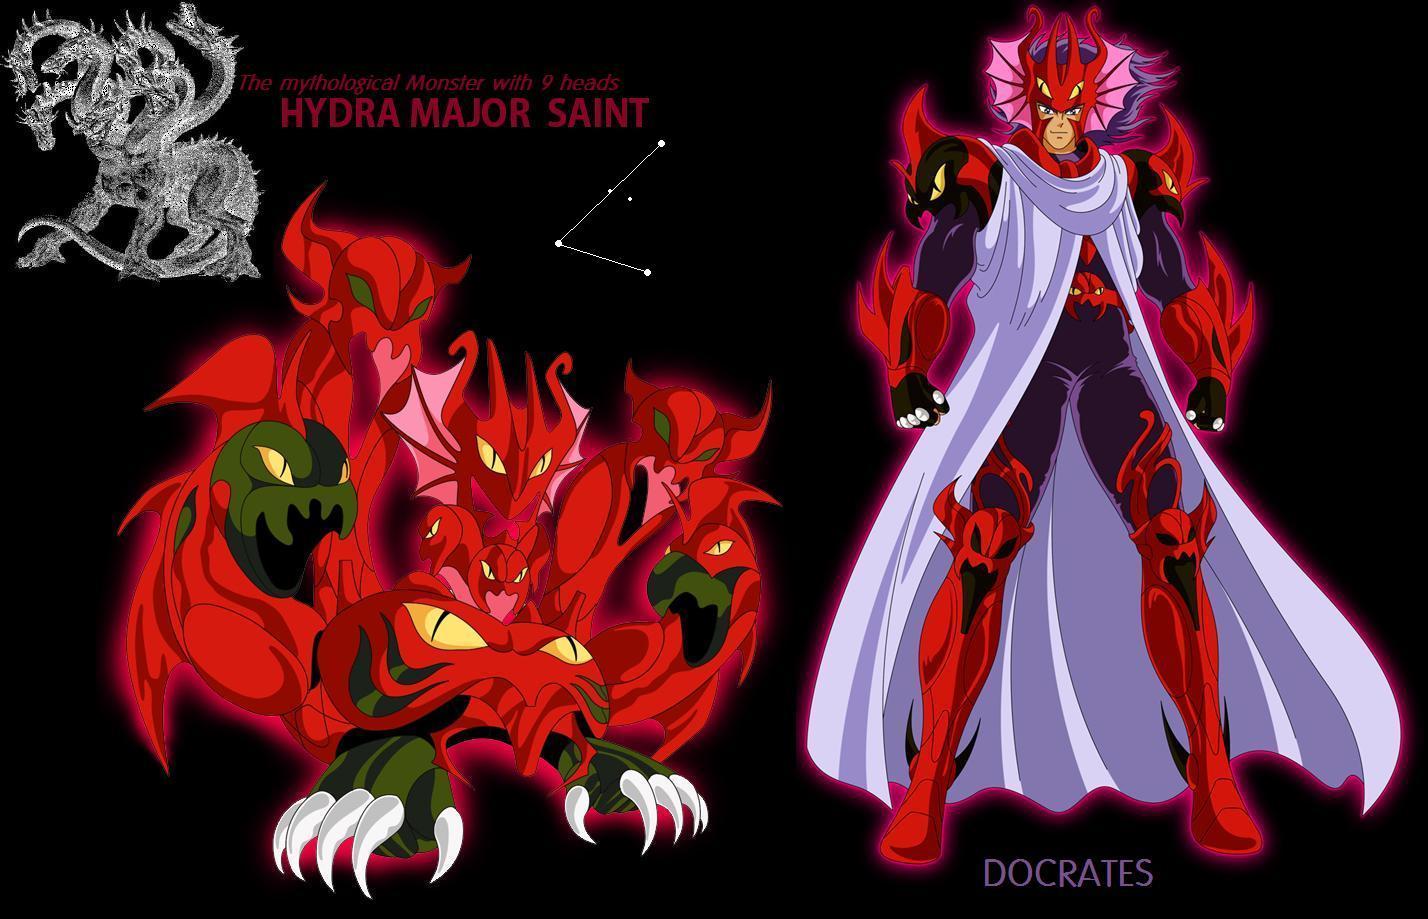 Caballero de Bronce Docrates de Hydra Lerna - Sonata Saints Hydra_Major_Saint